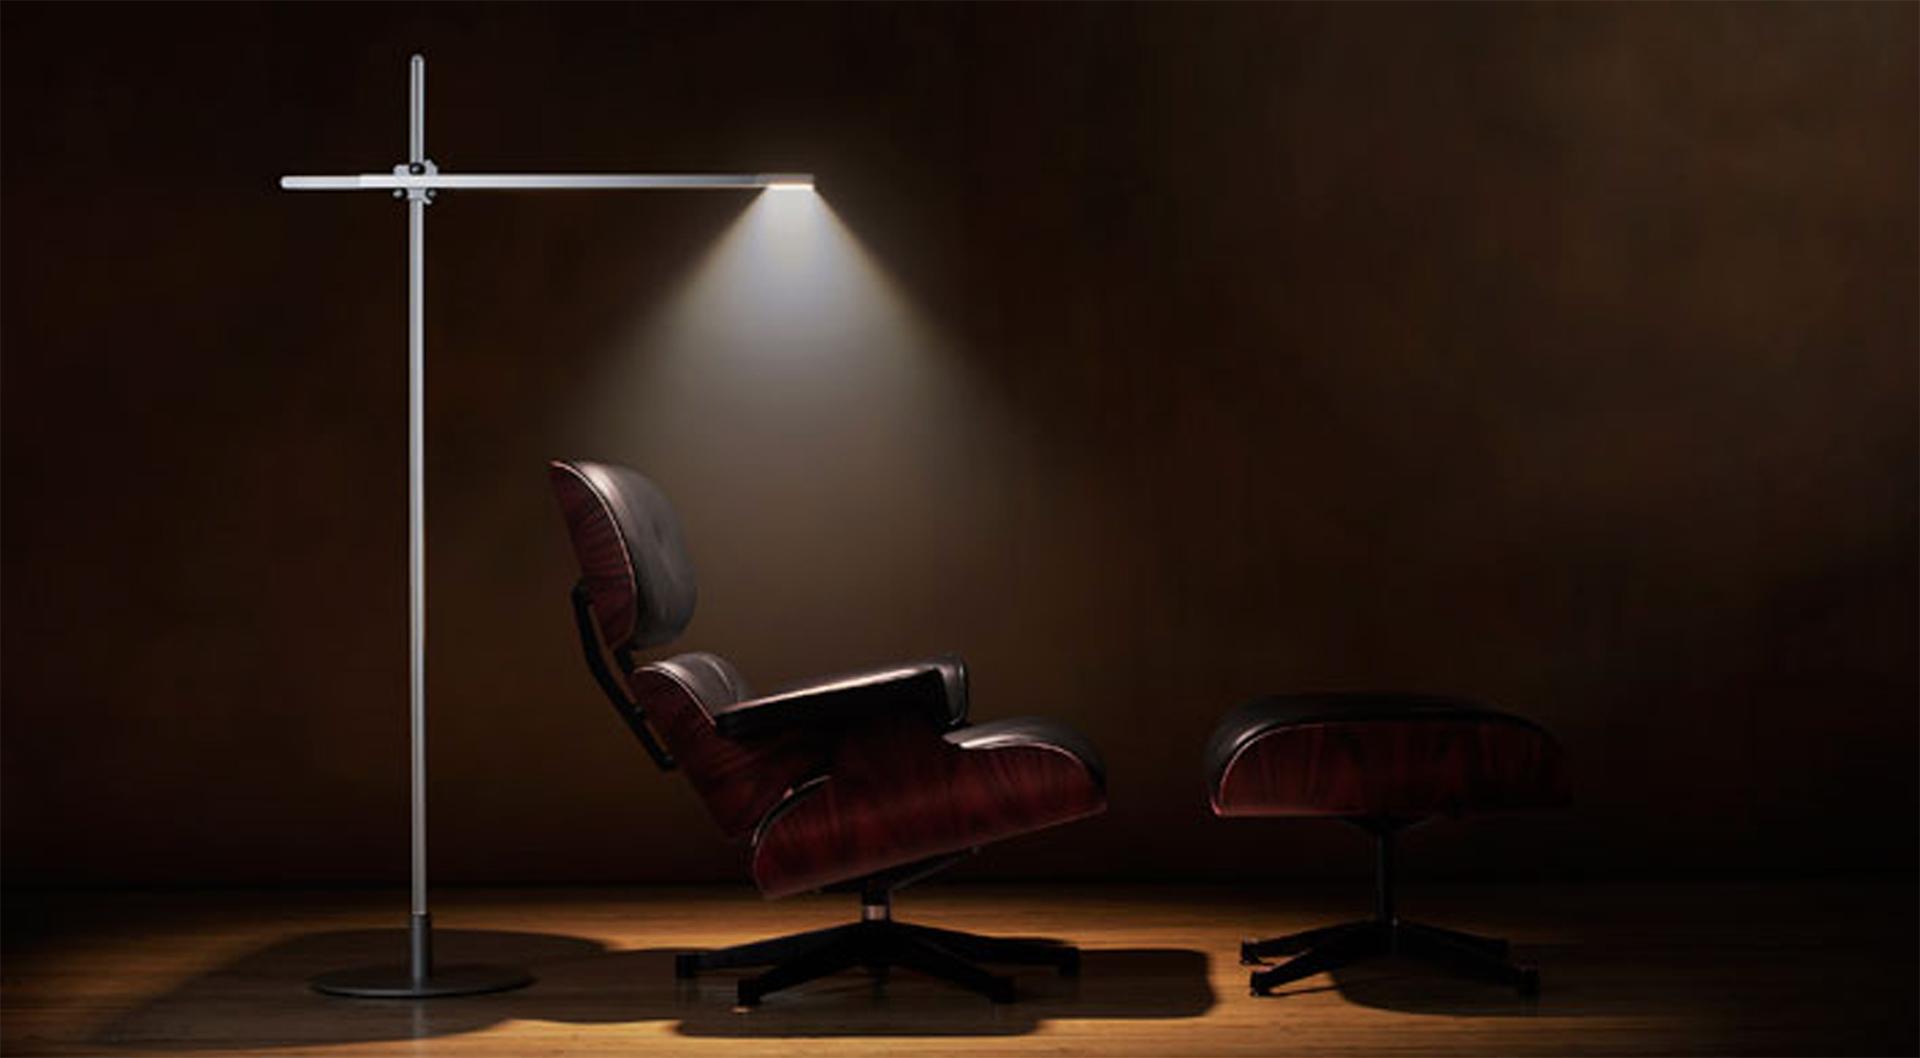 Csys Lighting By Jake Dyson Designapplause